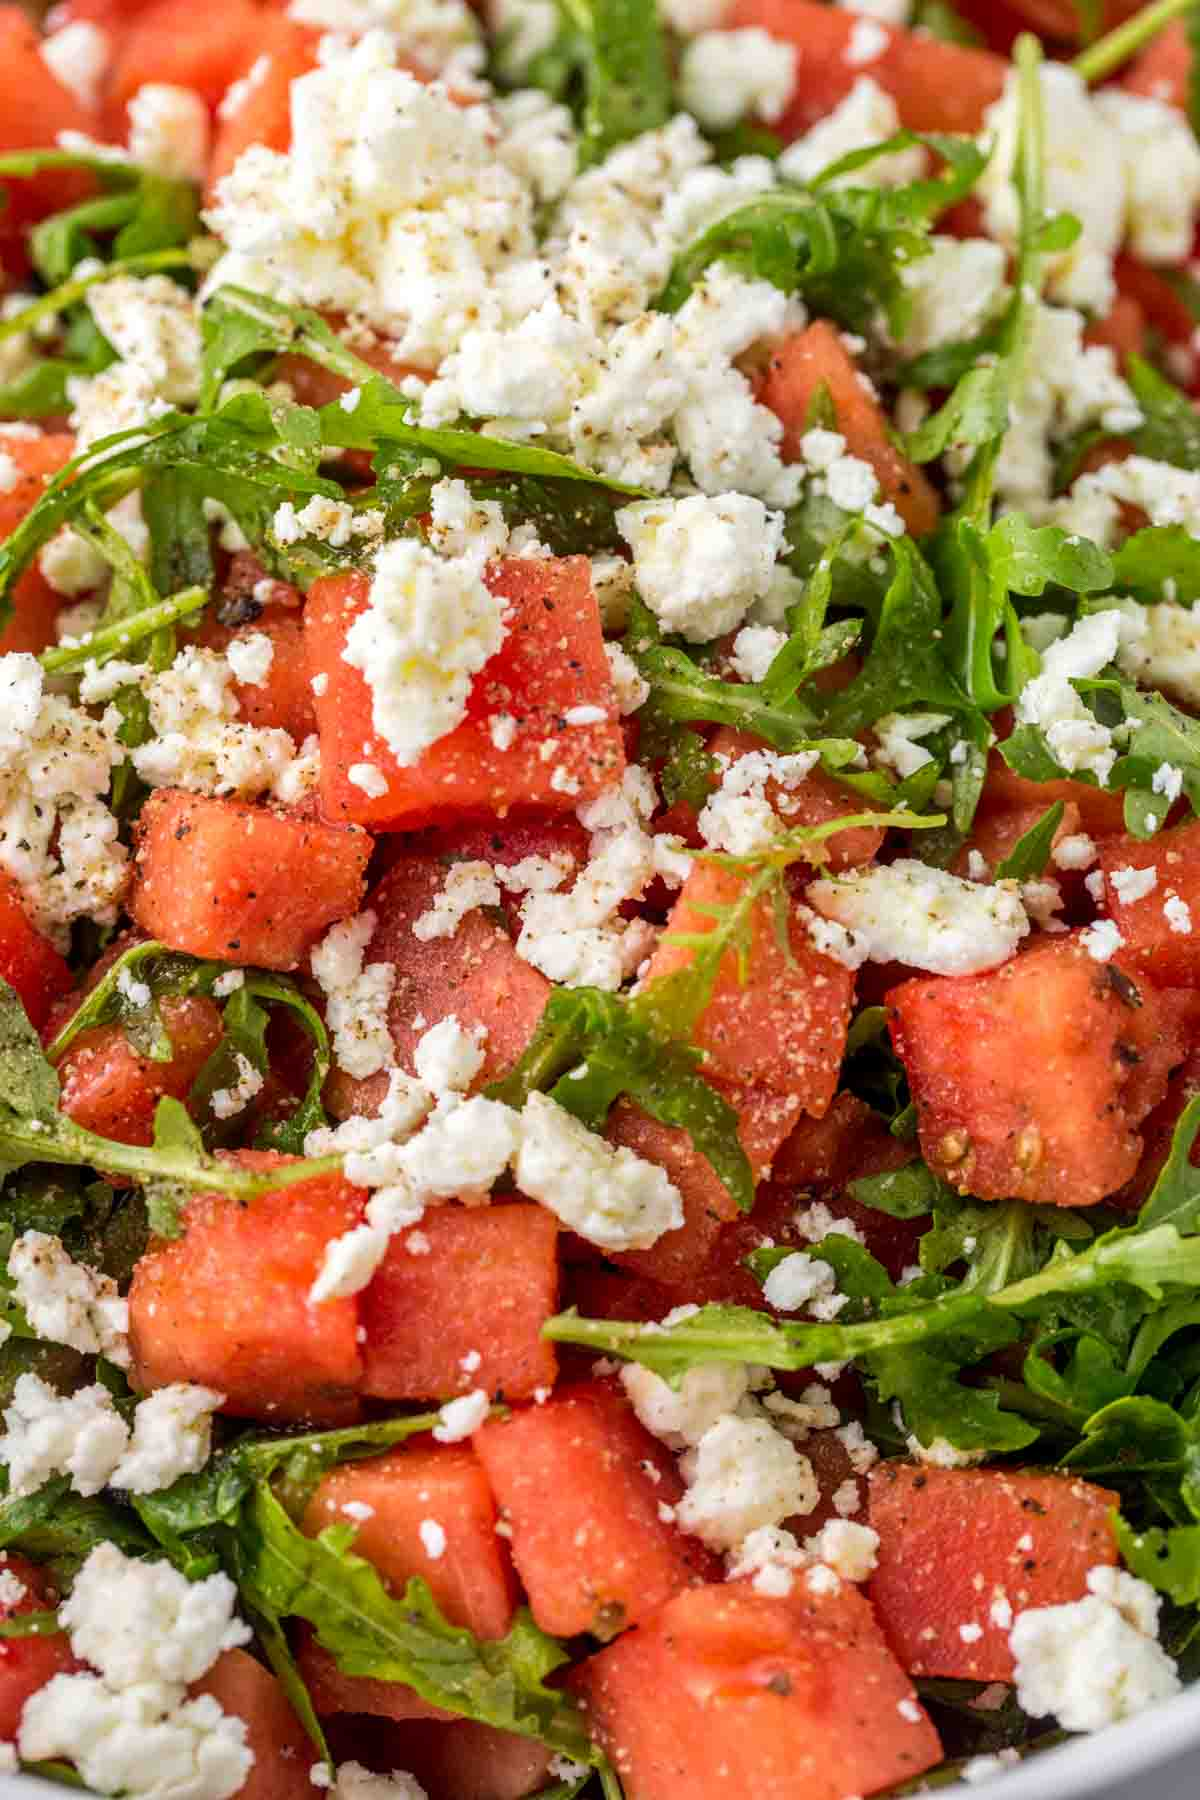 Close up shot of the salad